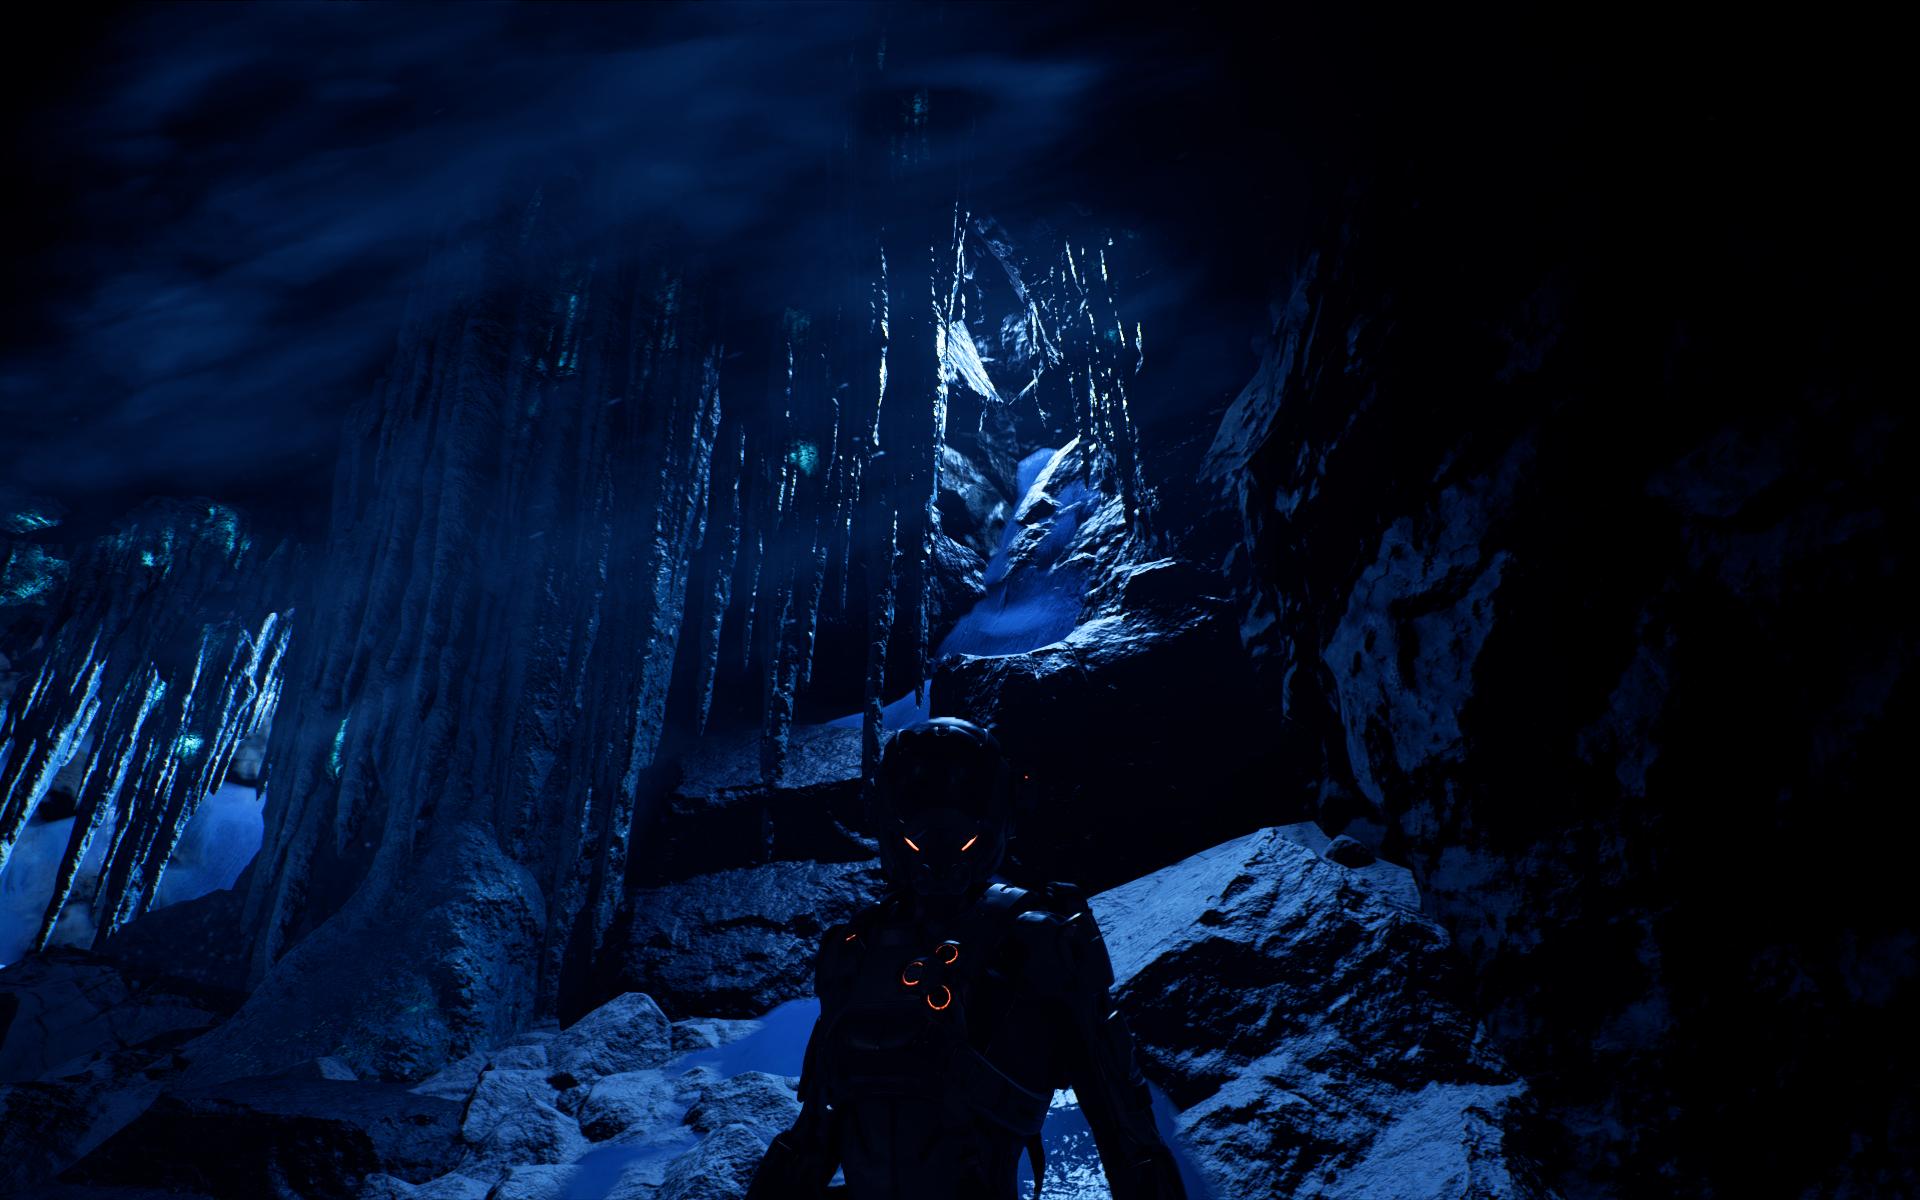 Mass Effect Andromeda Screenshot  - 18.33.09.28.png - Mass Effect: Andromeda